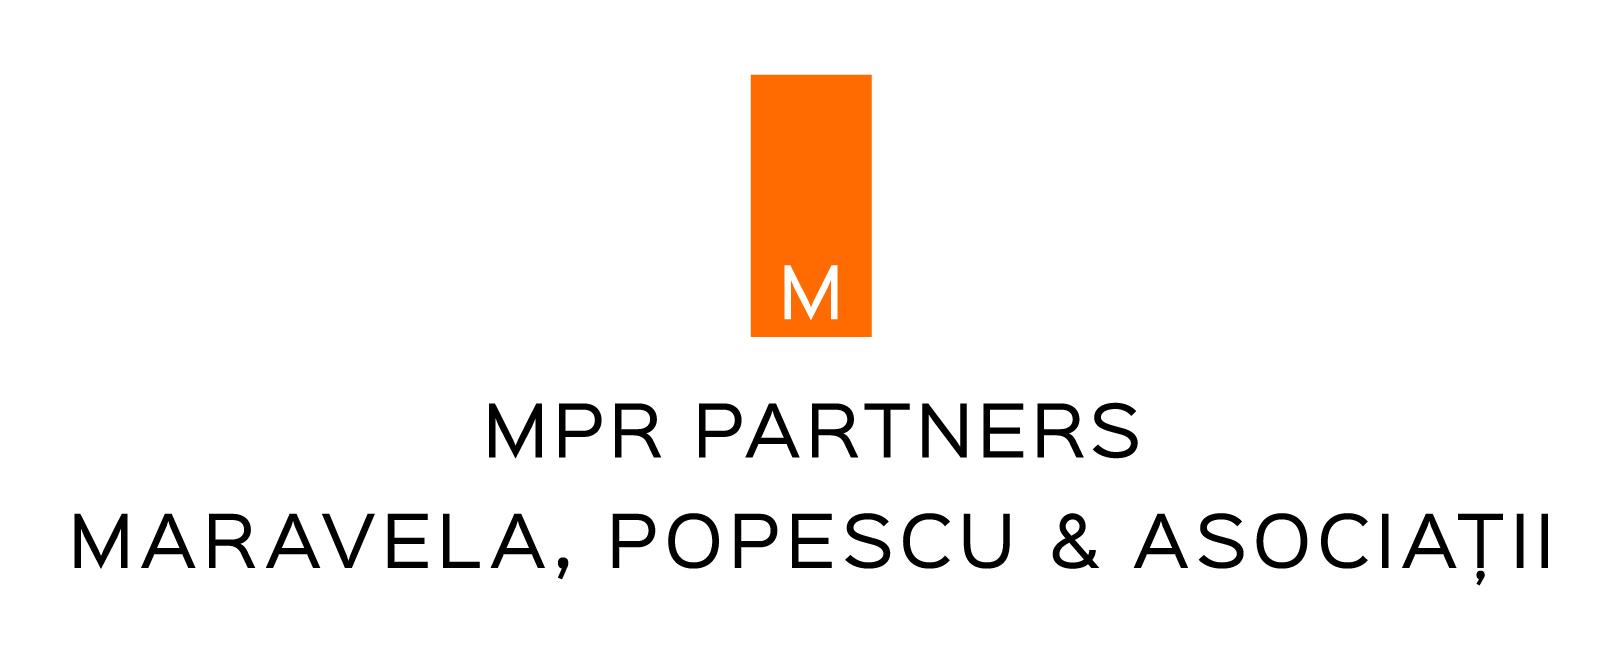 MPR Partners | Maravela, Popescu & Asociatii, https://iblc.com/images/firmlogos/MPR_RGB.jpg Logo